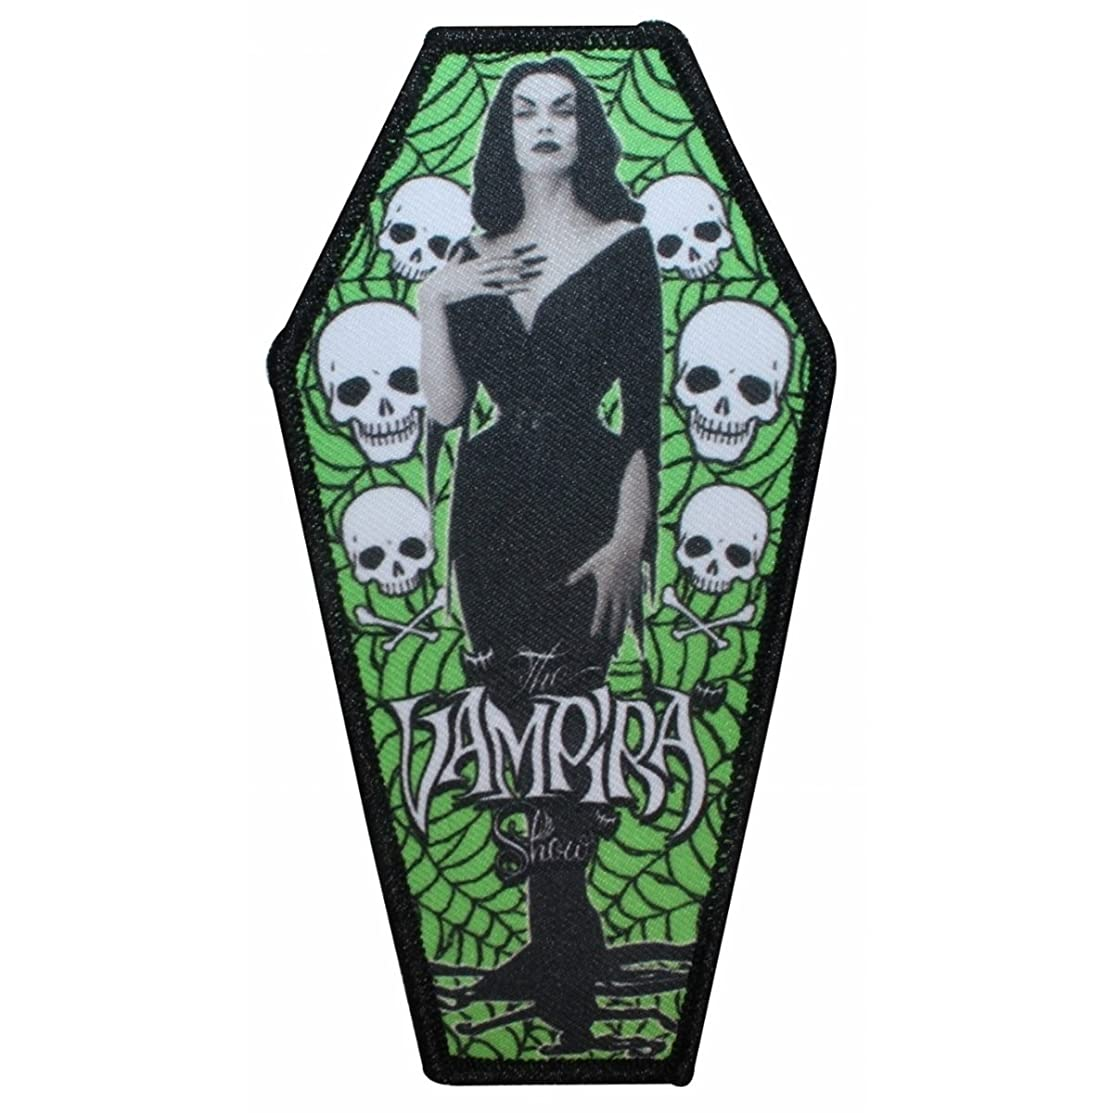 The Vampira Show Coffin Logo Horror Movies Kreepsville Iron On Applique Patch